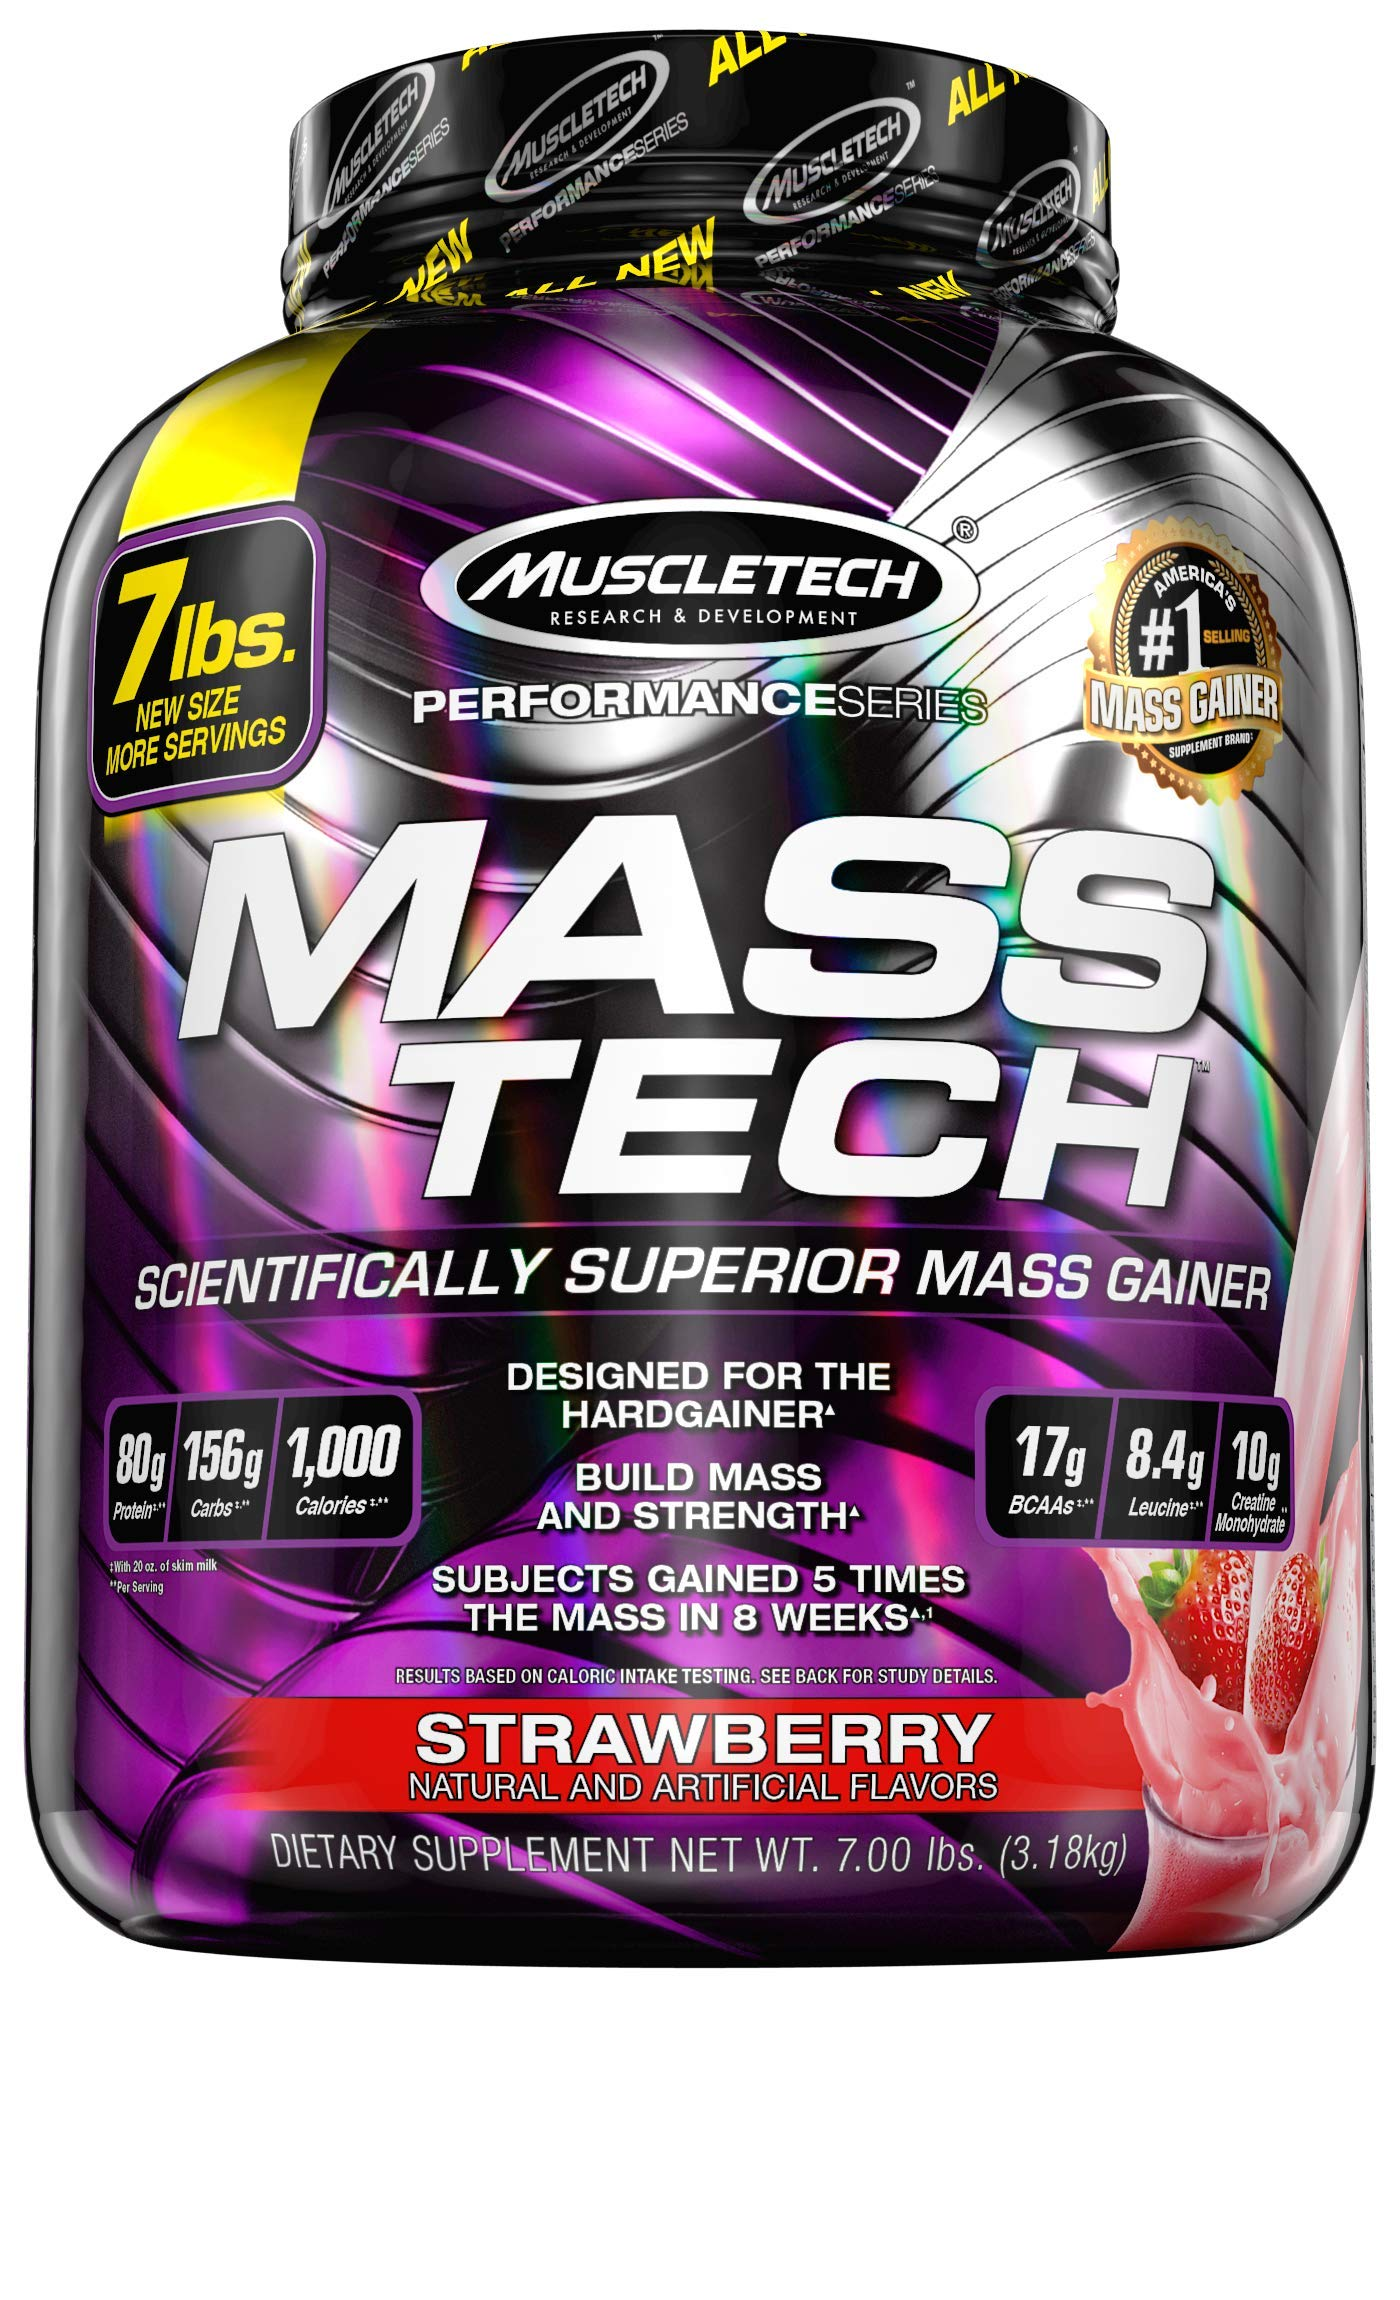 Mass Gainer Protein Powder | MuscleTech Mass-Tech Mass Gainer | Whey Protein Powder + Muscle Builder | Weight Gainer | Protein Powder for Muscle Gain | Creatine Supplements | Strawberry, 7 lbs